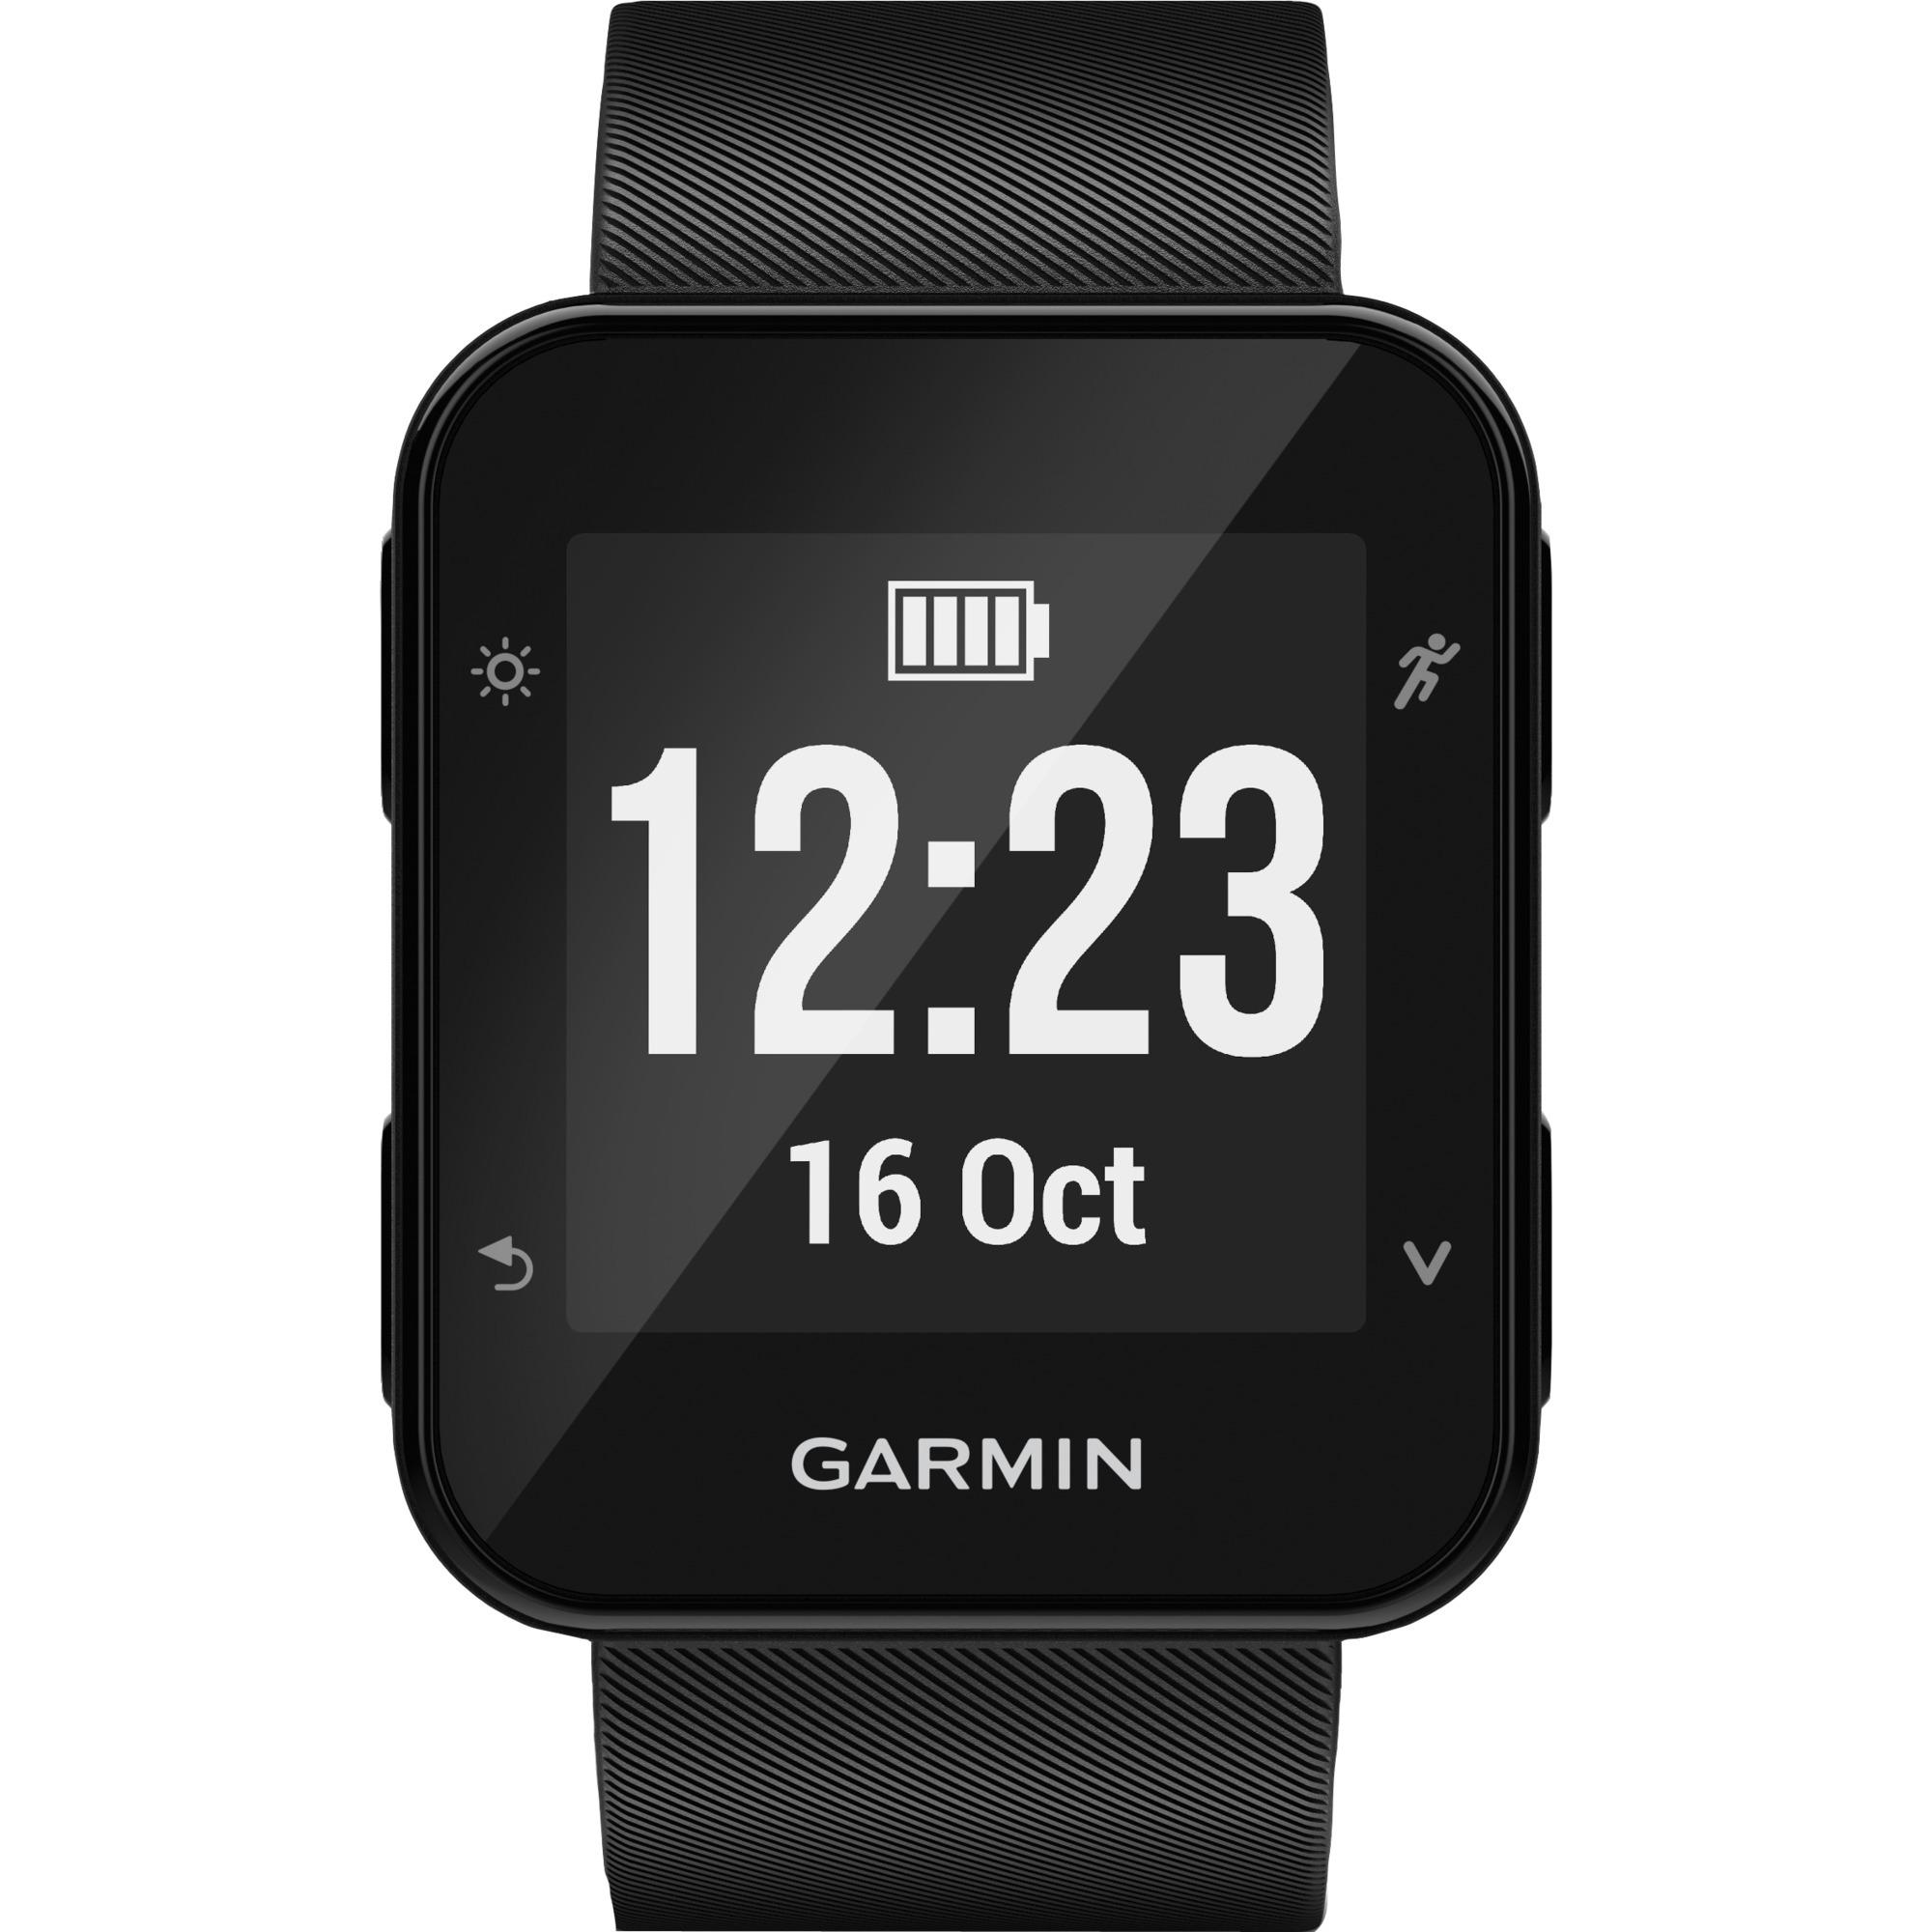 f089dccbd9f4 Garmin Forerunner 35 reloj deportivo Negro 128 x 128 Pixeles Bluetooth